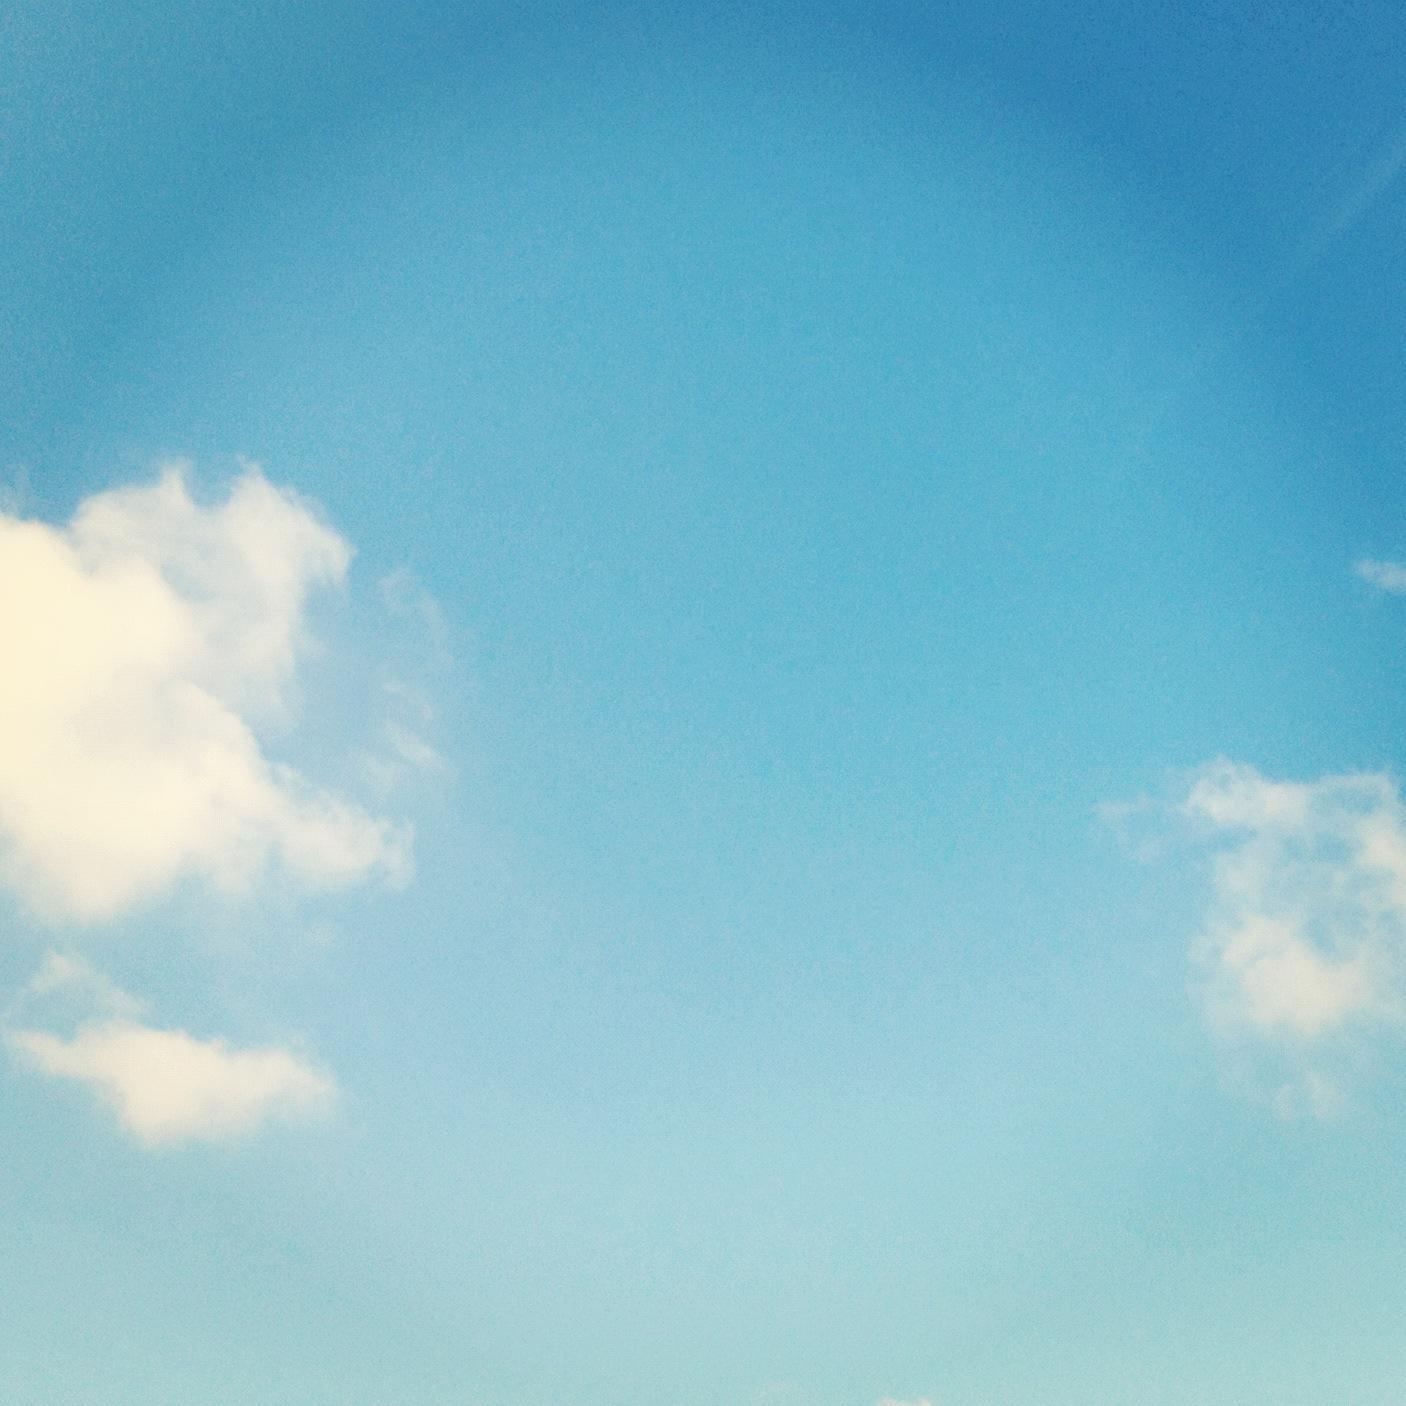 Blue Sky Instagram